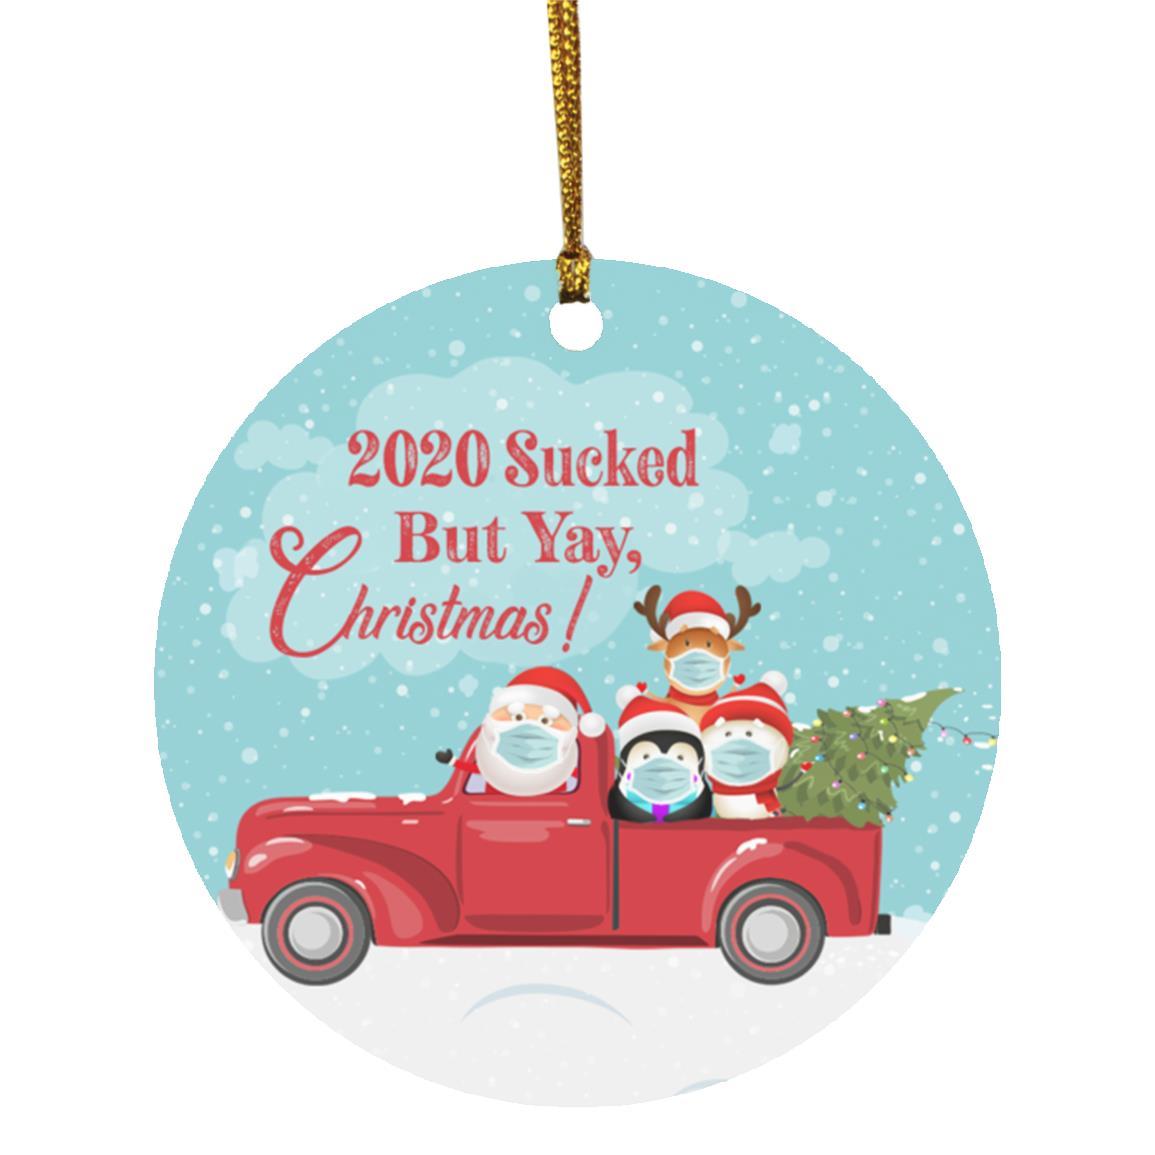 Santa Christmas Ornaments 2020 2020 Sucked But Yay Christmas Santa Ornament Cubebik Santa moth meme shirt, funny christmas meme shirt, santa moth meme shirt. 2020 sucked but yay christmas santa mask ornament funny holiday reindeer quarantined gift